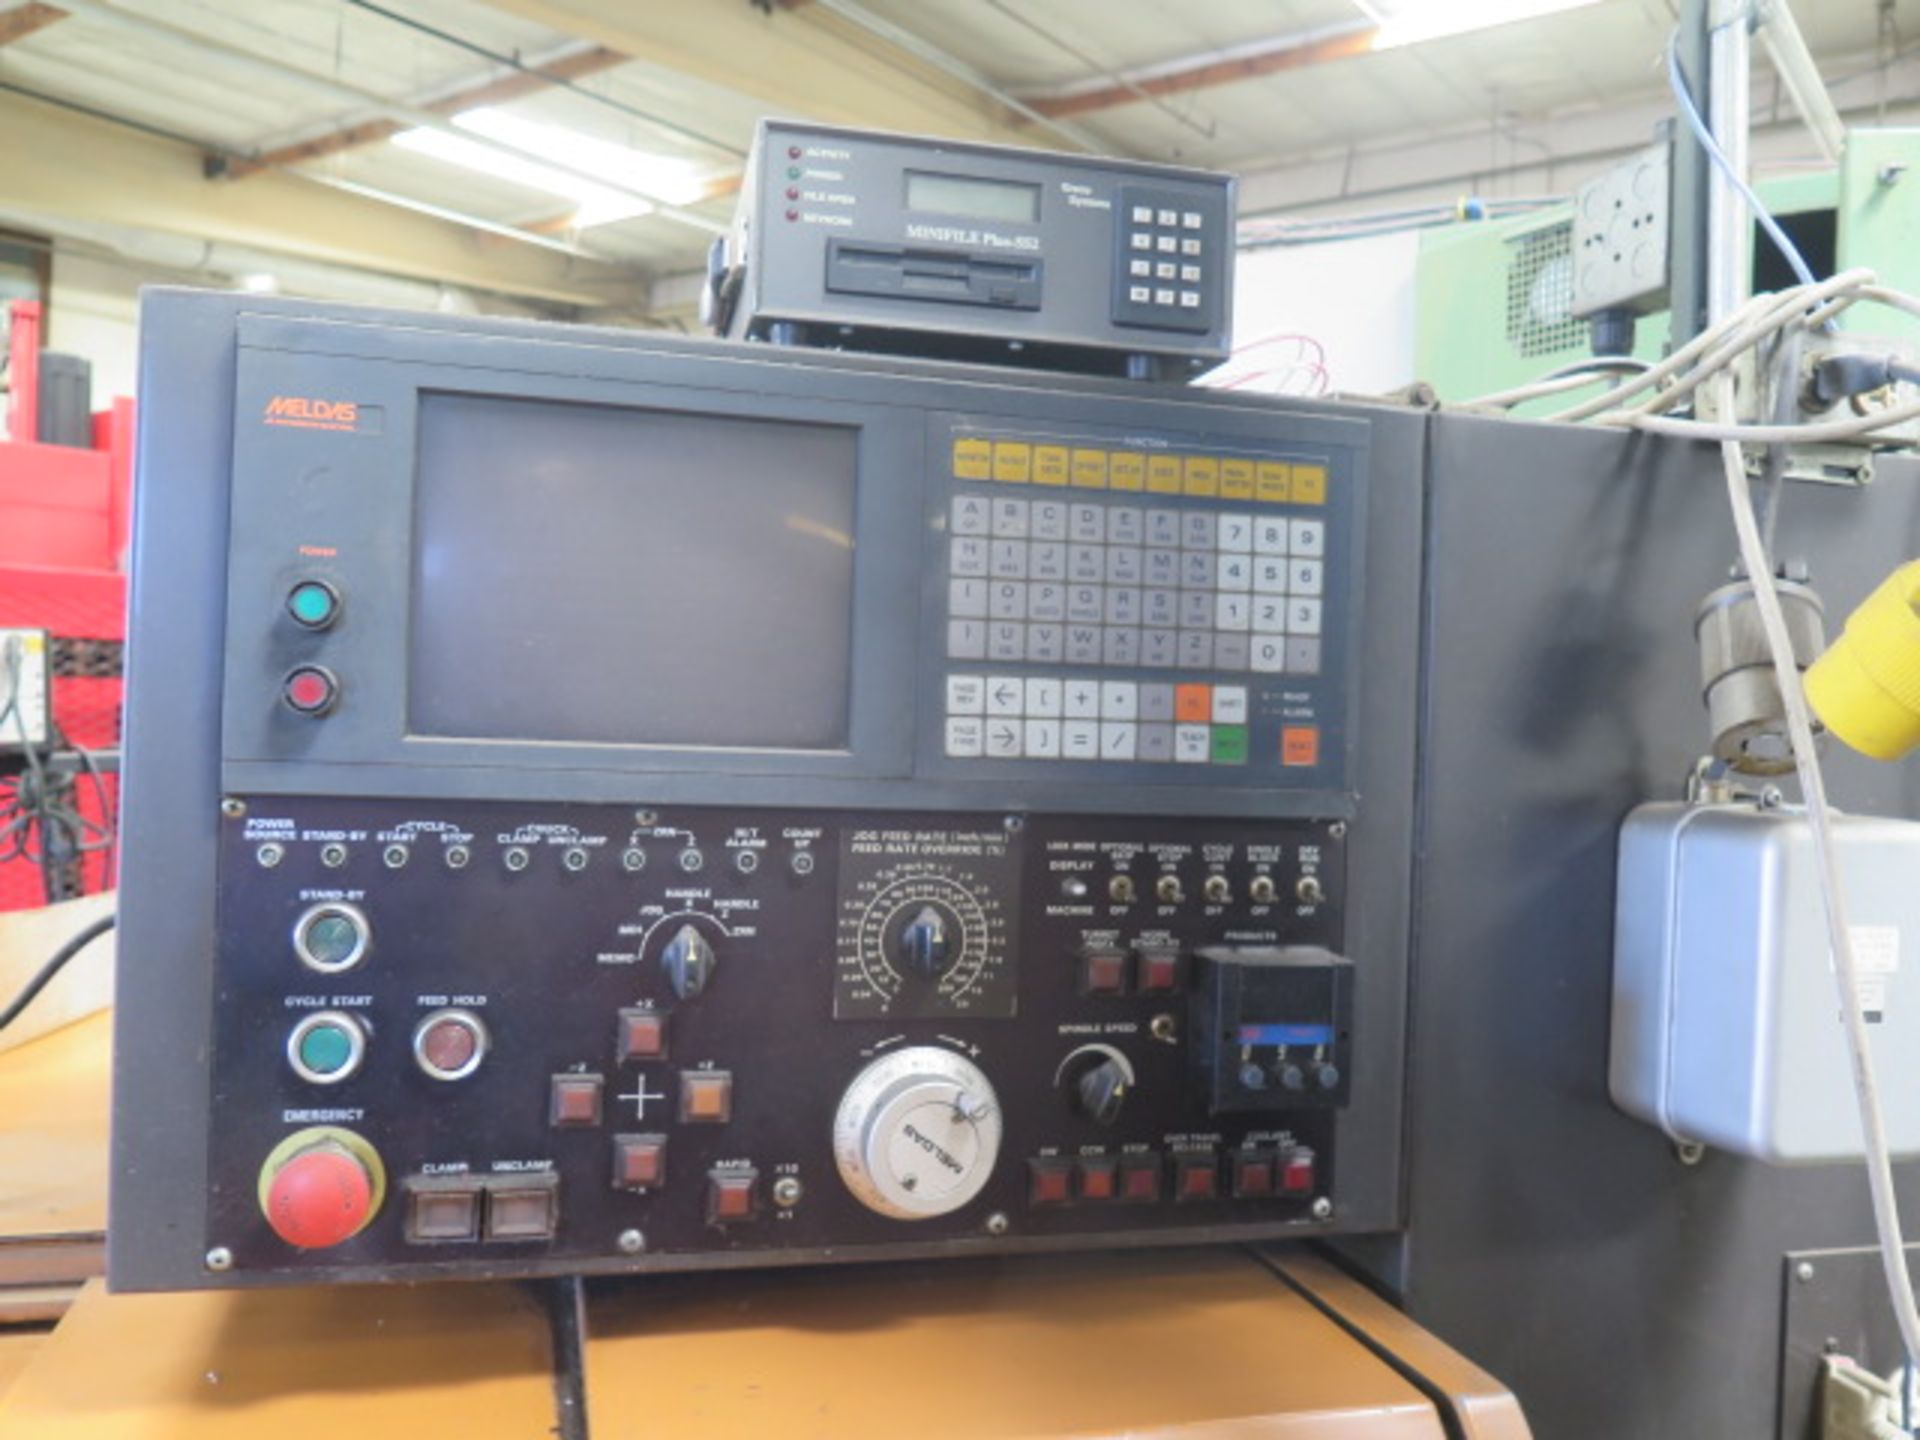 Tsugami NM3 CNC Turning Center s/n 6029 w/ Mitsubishi Meldas Controls, 8-Station Turret, SOLD AS IS - Image 5 of 16